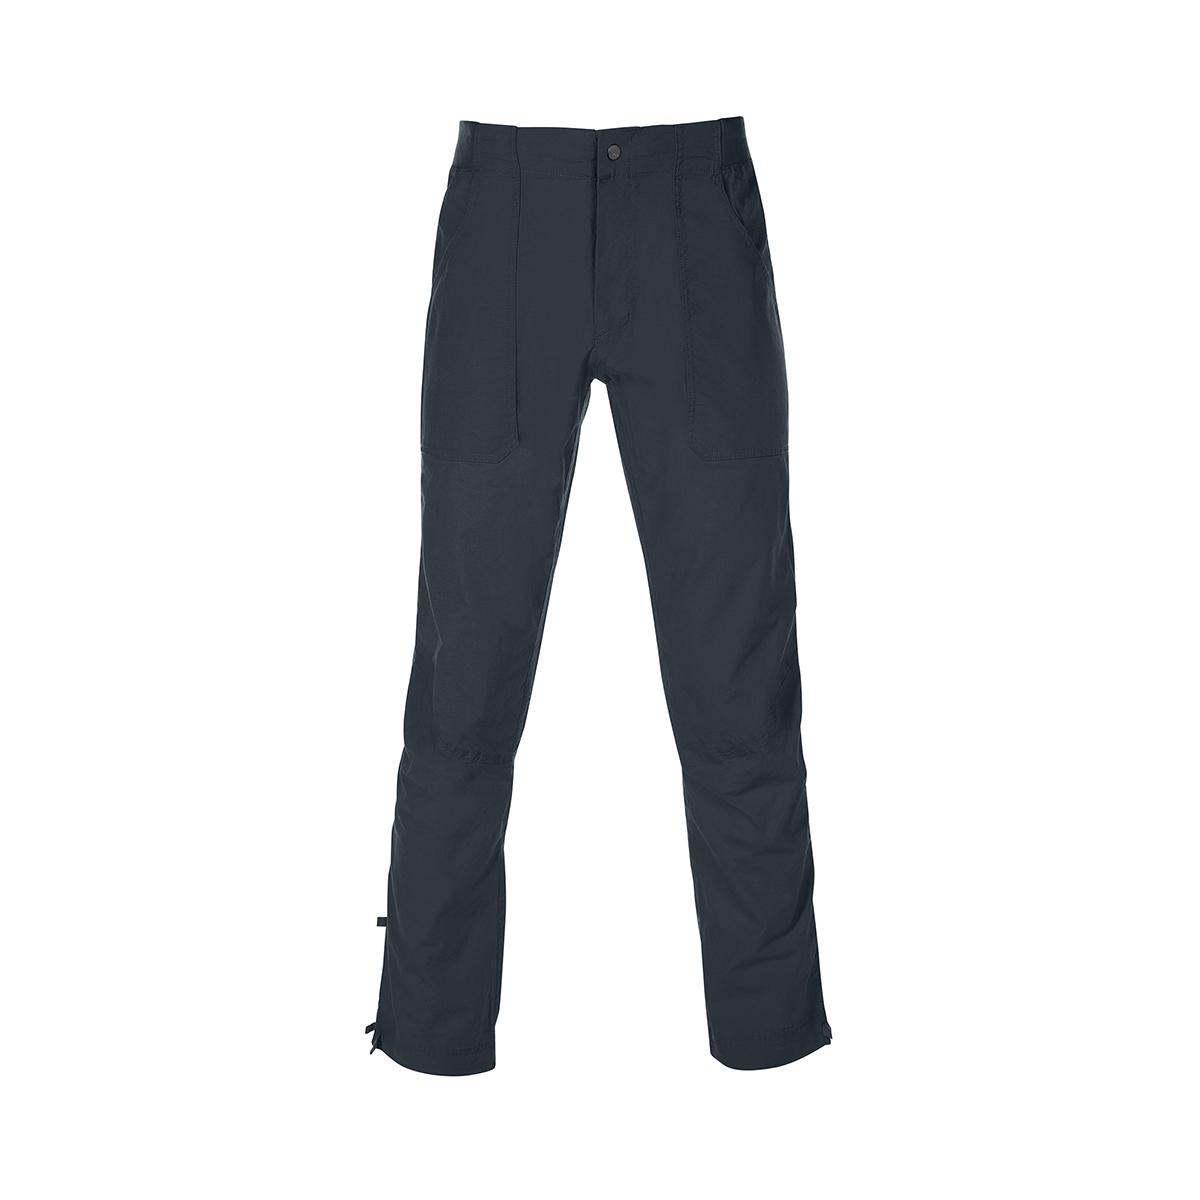 Rab Oblique Walking Pants